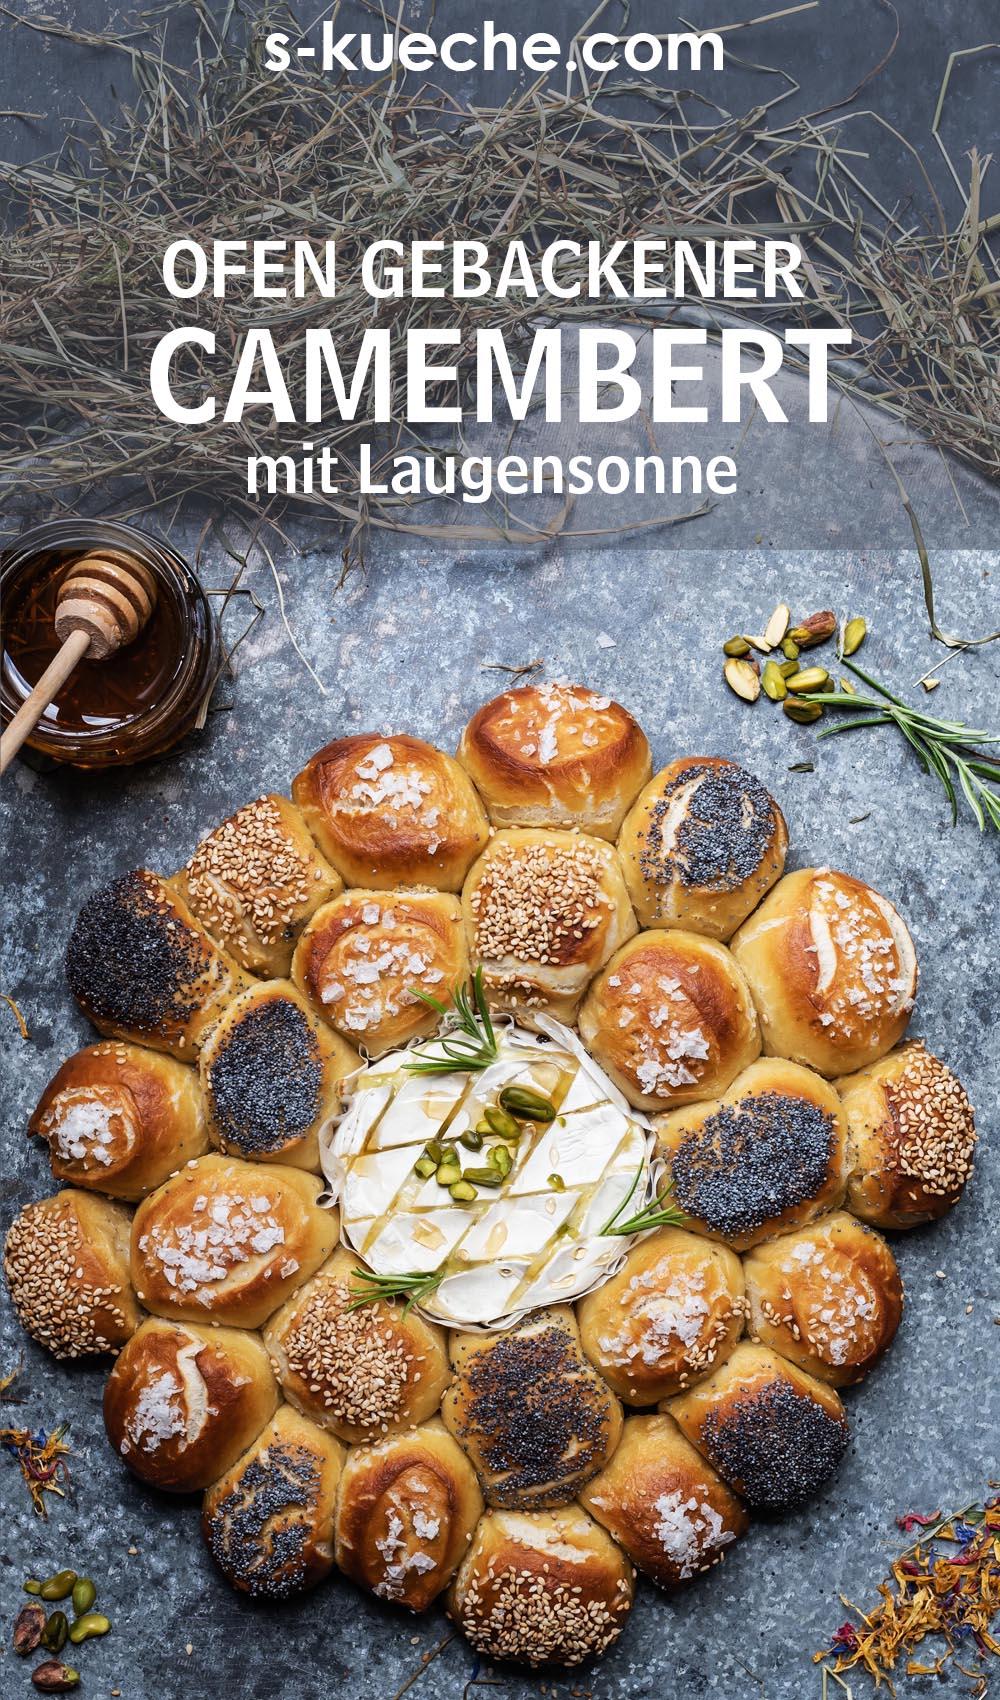 Heumilch Camembert aus dem Ofen mit Laugengebäck